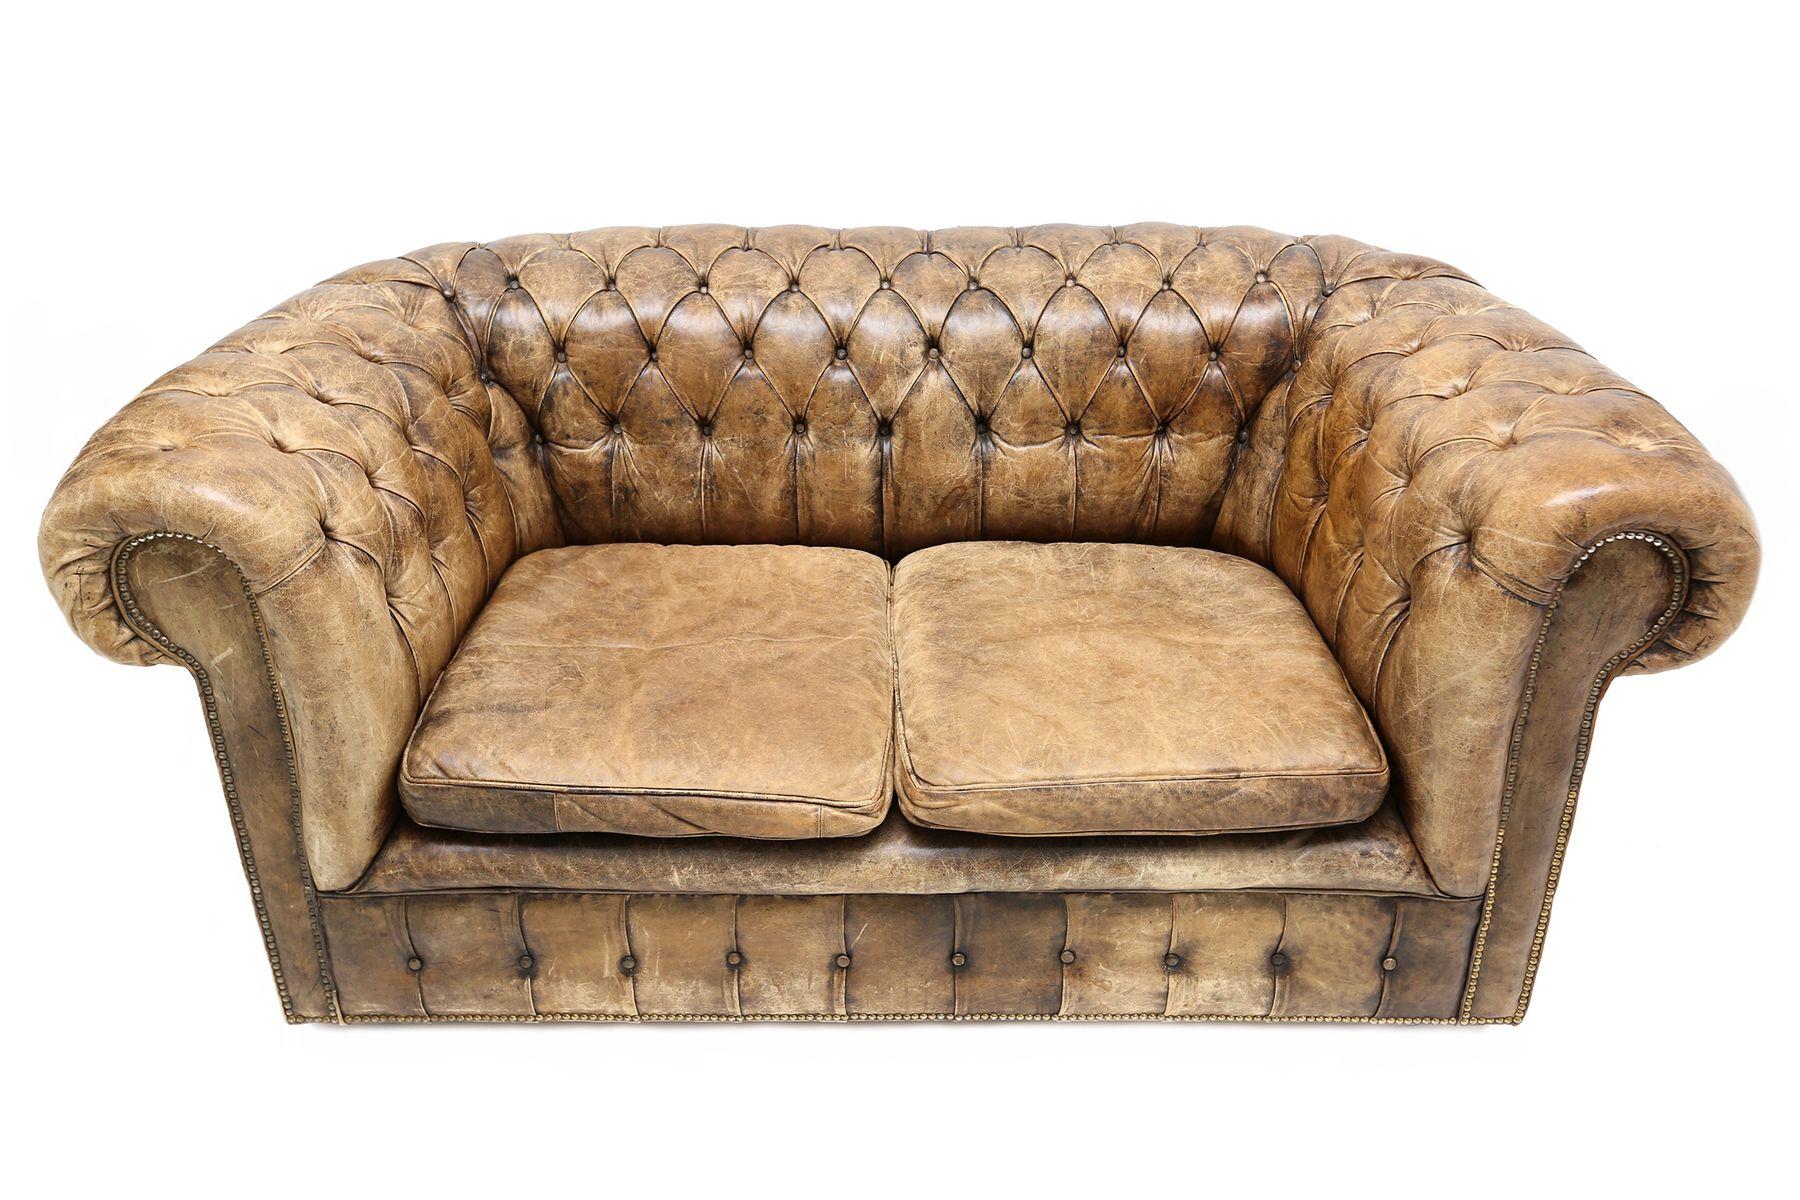 canap chesterfield vintage angleterre 1940s en vente sur pamono. Black Bedroom Furniture Sets. Home Design Ideas